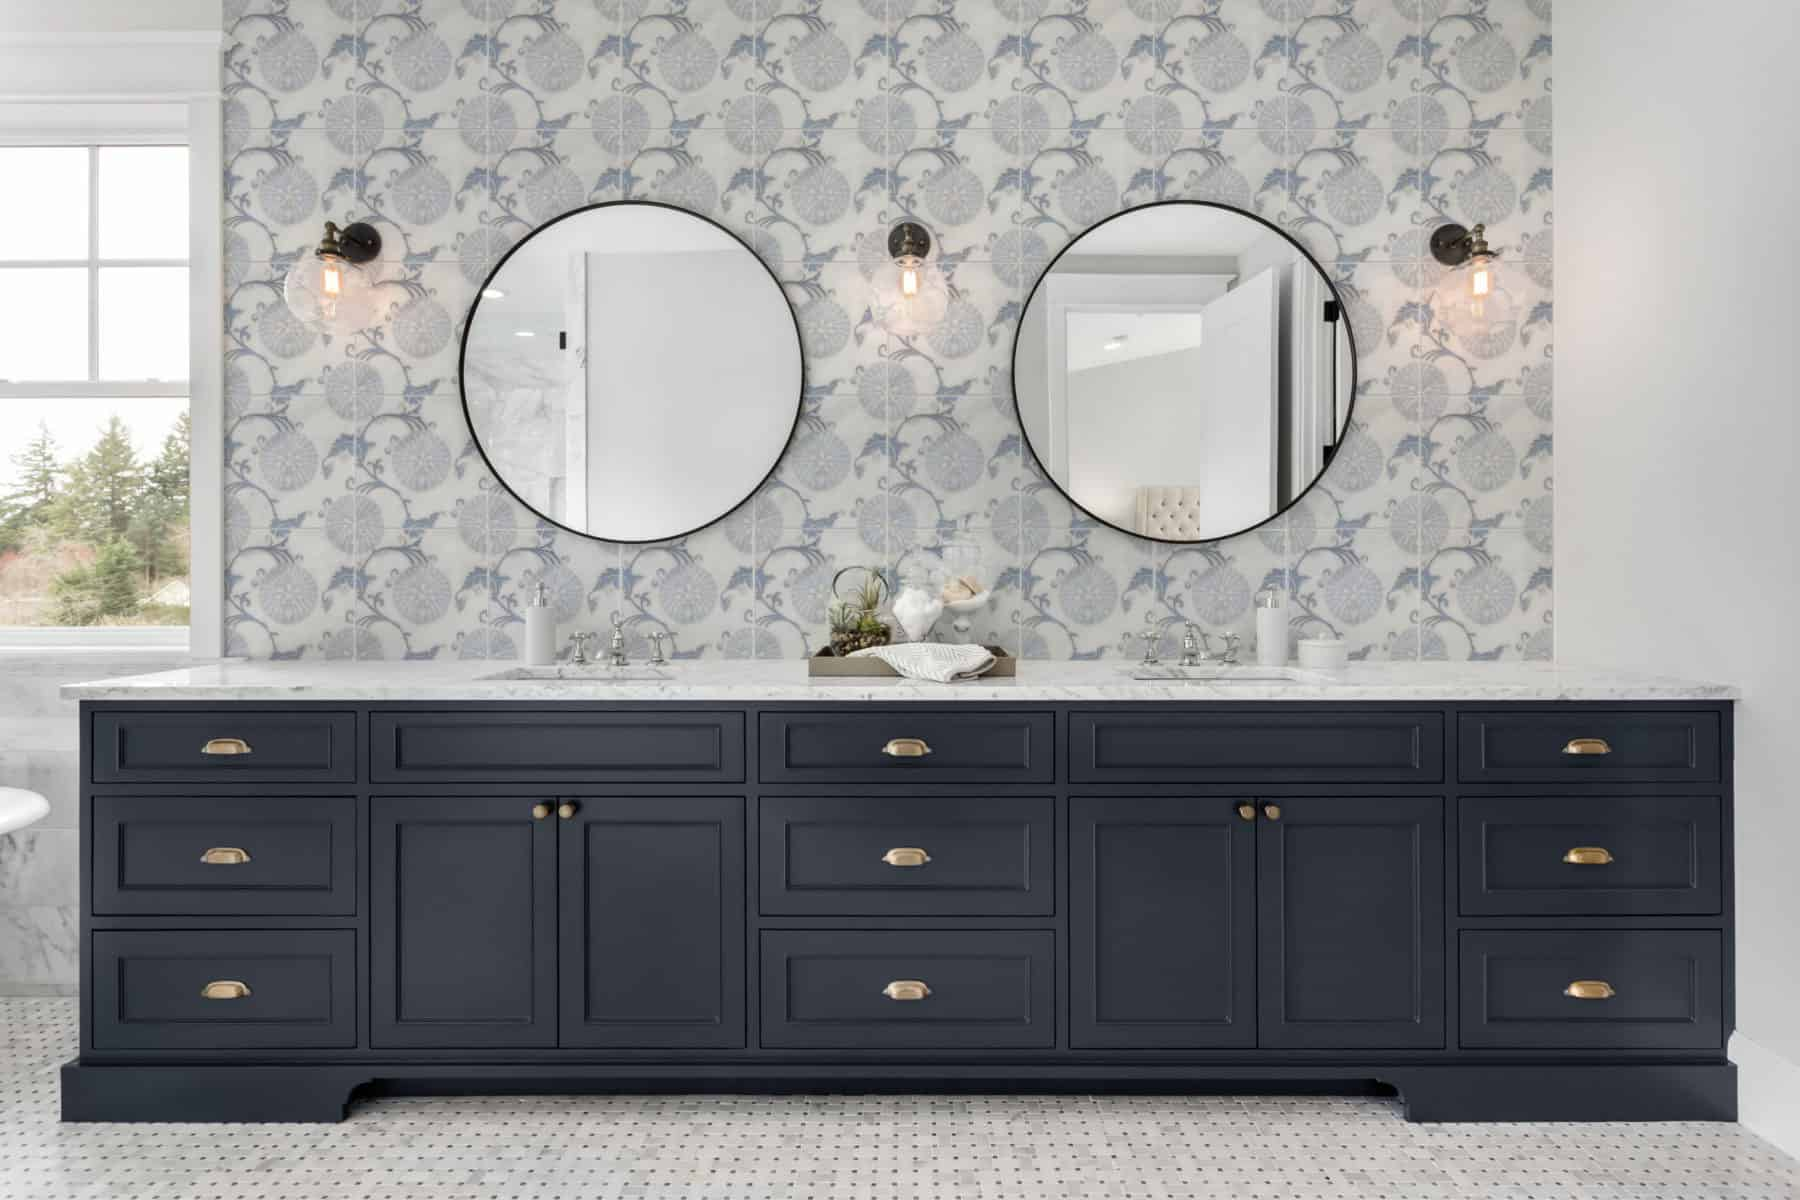 Eliana (Dusty Blue) Carrara 12x12 Bathroom